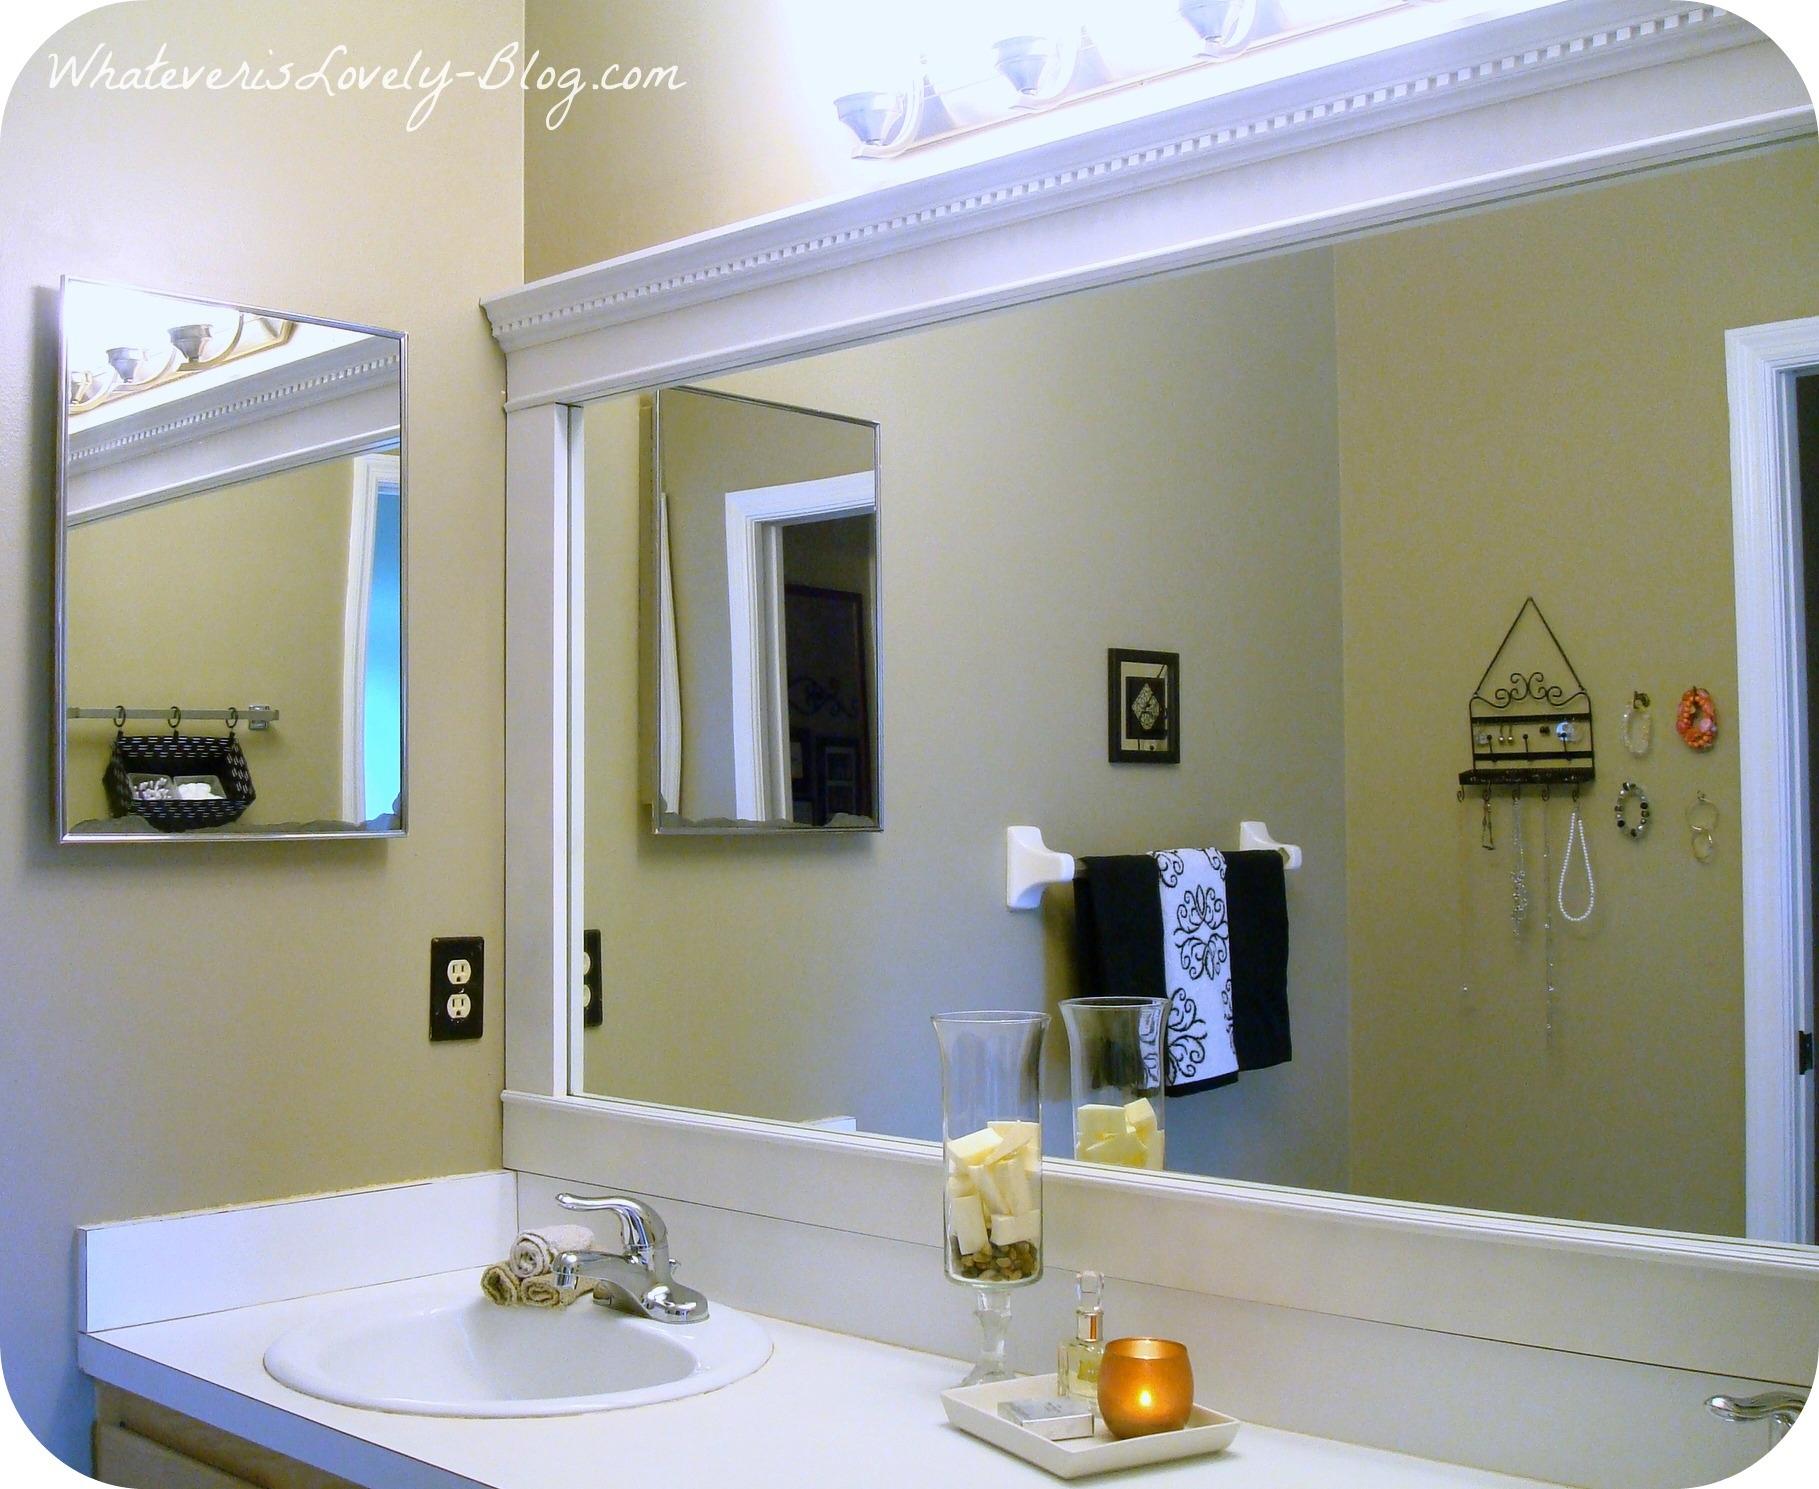 Framed Bathroom Mirror Largea reason why you shouldnt demolish your old barn just yet